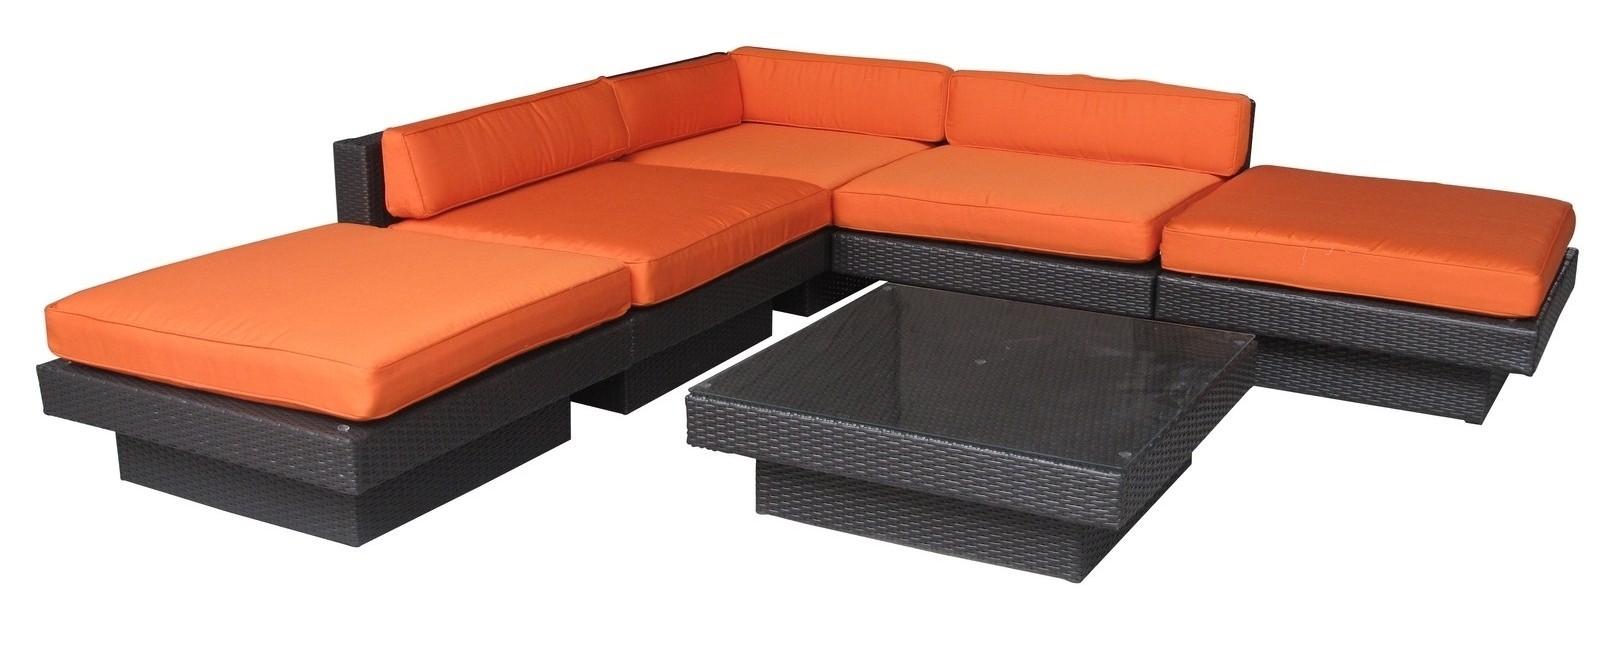 Laguna Outdoor Rattan 6 Piece Set In Espresso with Orange Cushions from Reneg